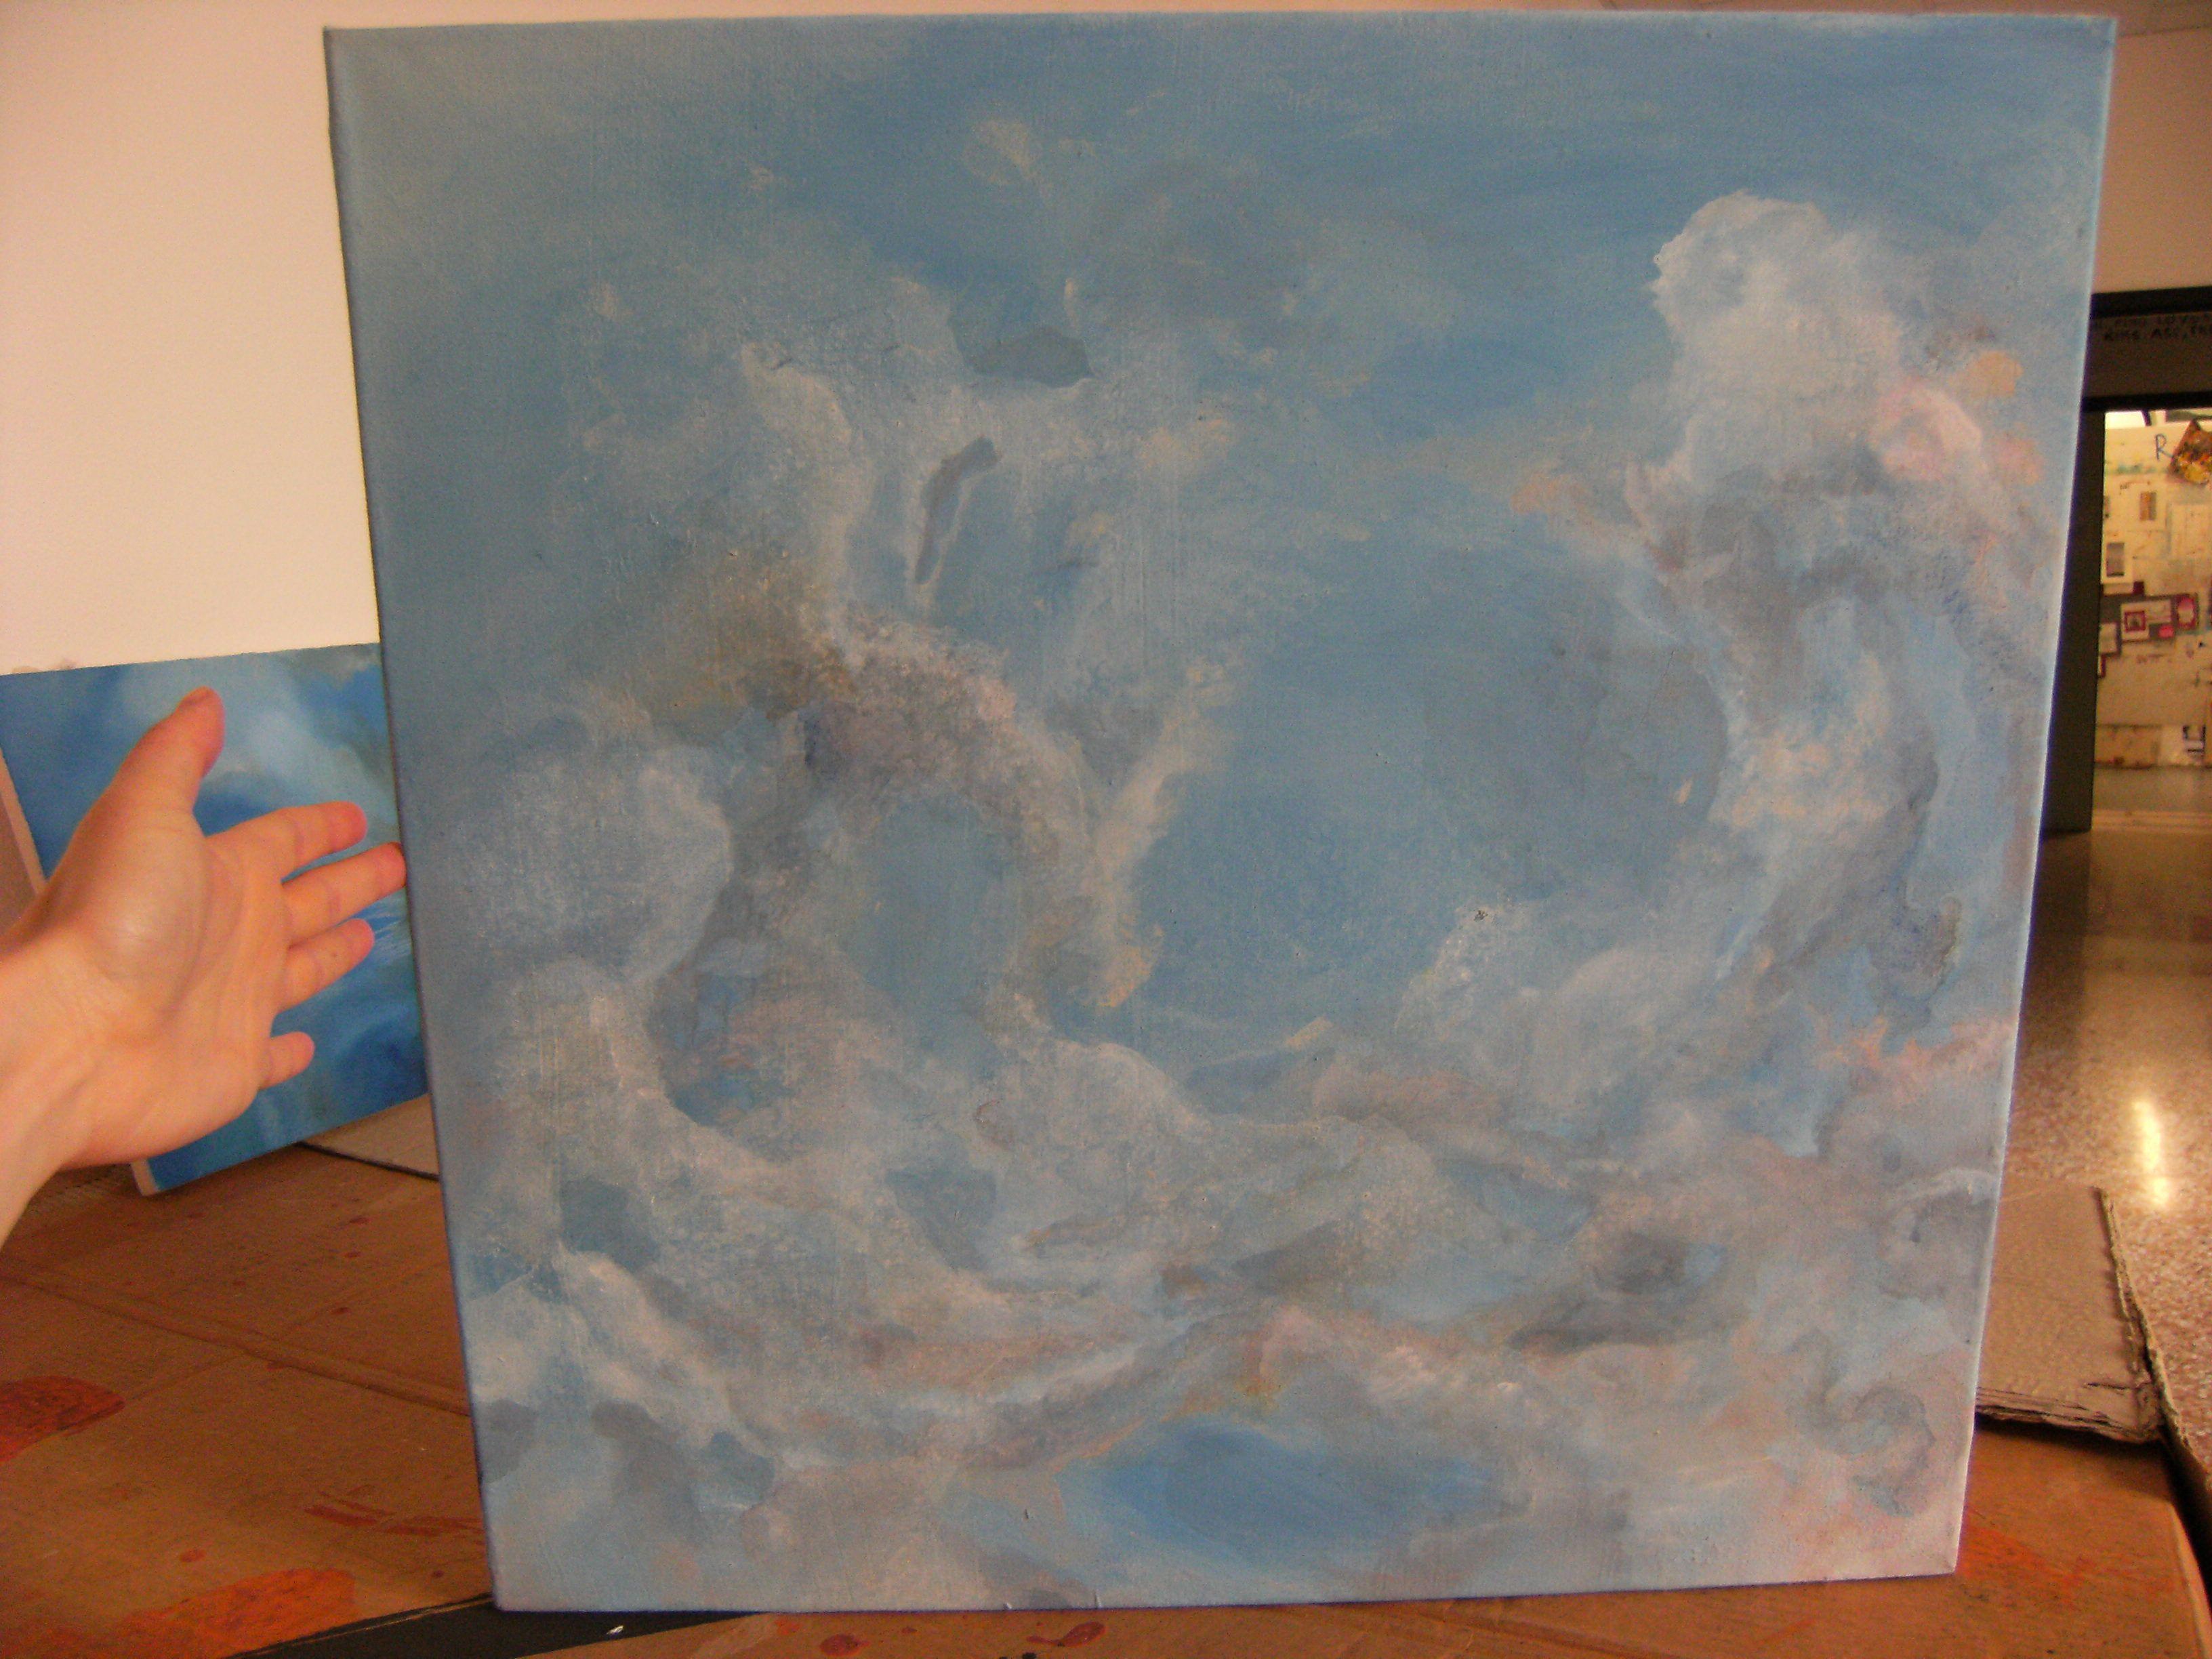 Cloud's serenity - by Elisa Ciscato